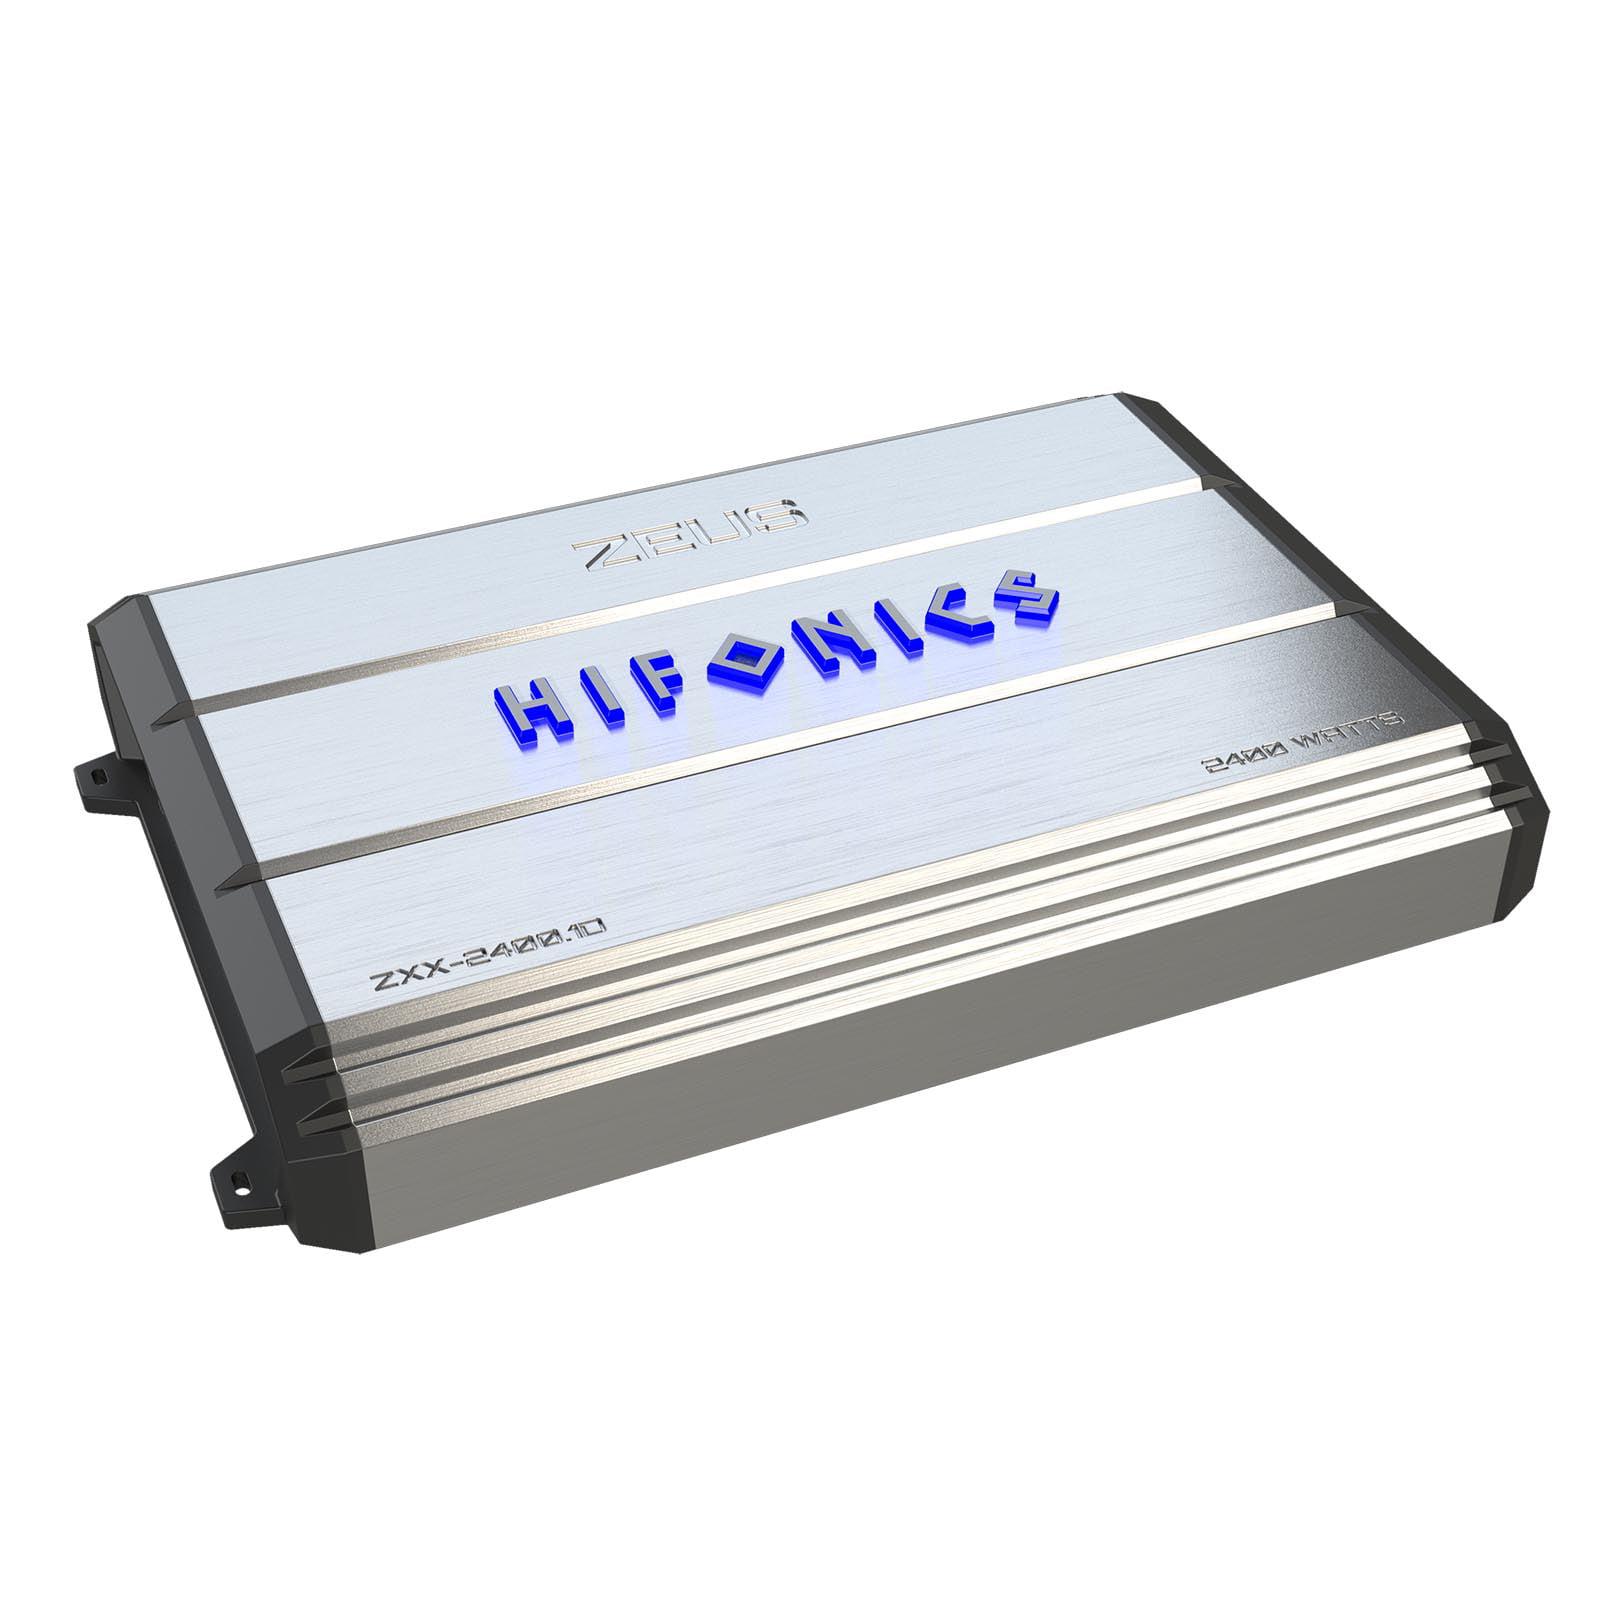 Hifonics ZXX-2400.1D Zeus Series Monoblock Class D Amp (2,400 Watts)